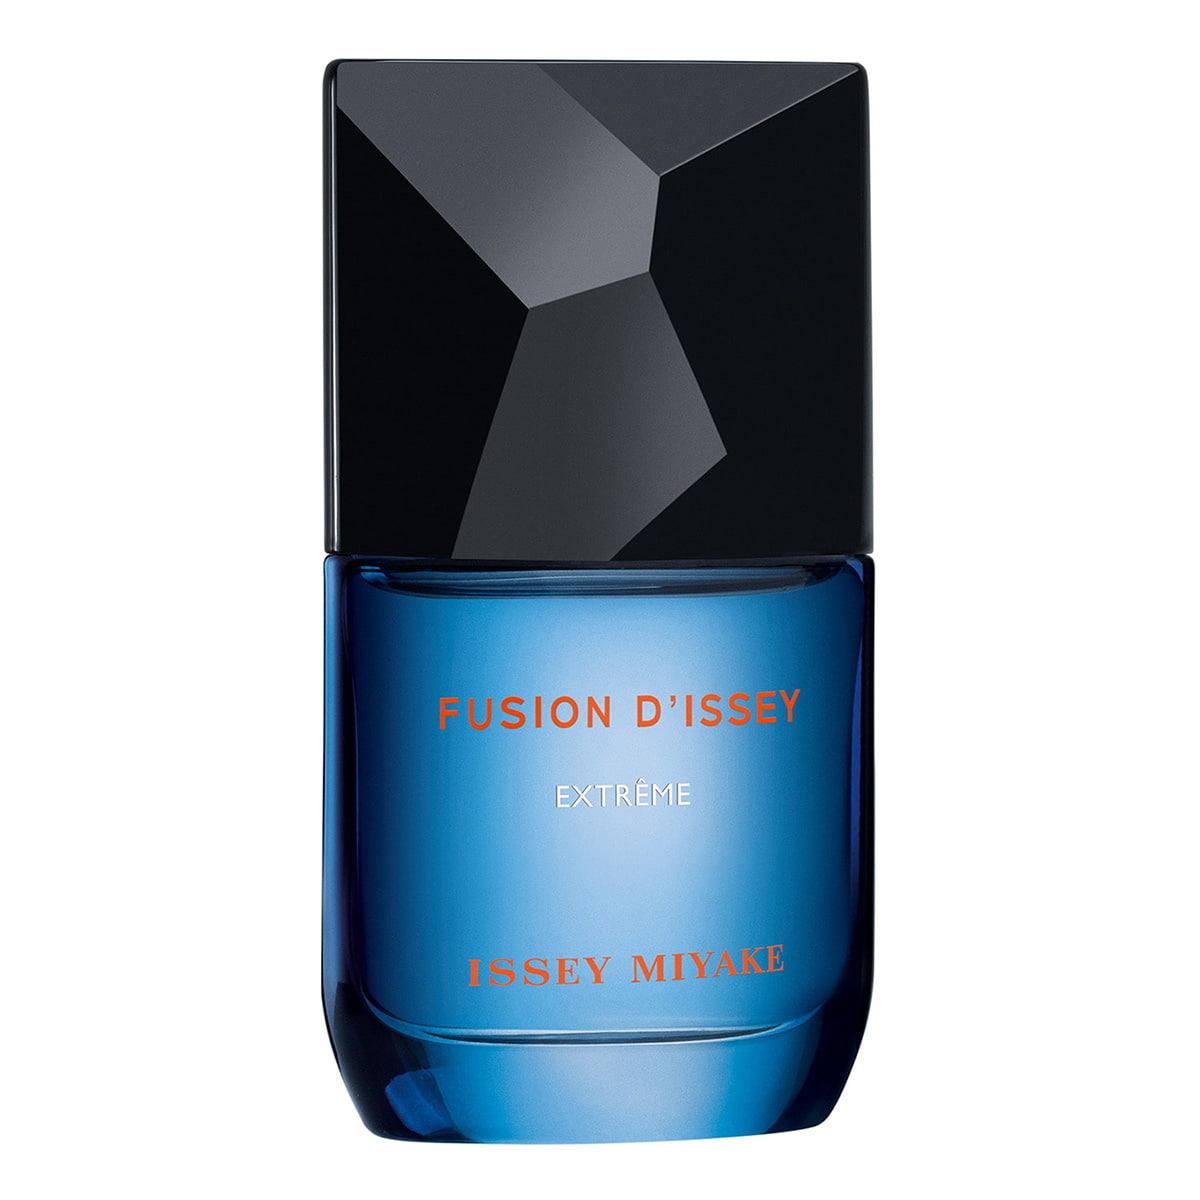 Issey Miyake Fusion d'Issey Extrême - Eau de Toilette Intense